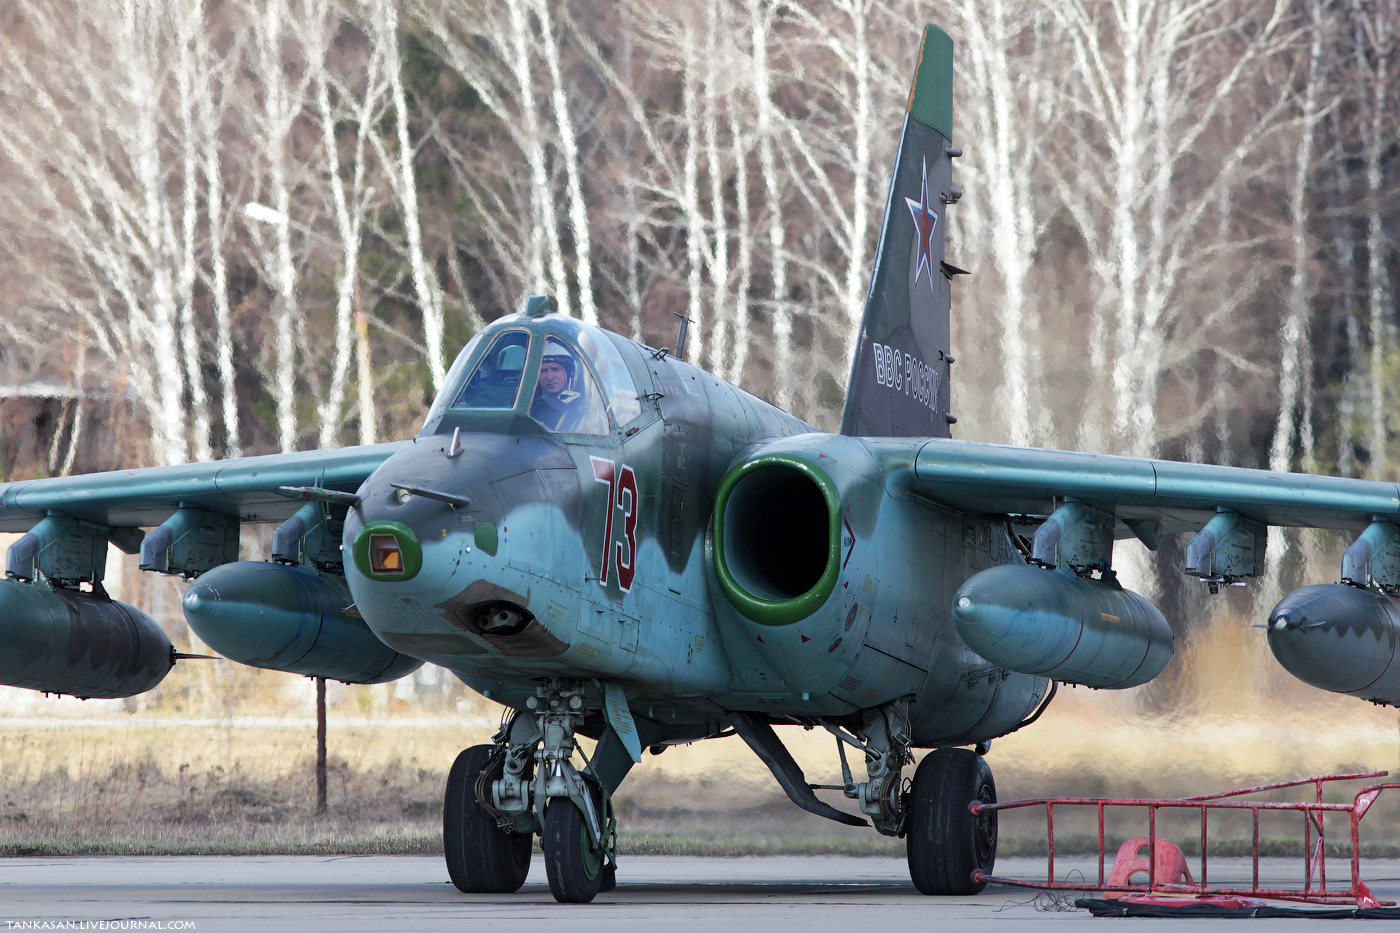 Sukhoi Su-25 Frogfoot - Page 3 0_b8738_aa08396d_orig